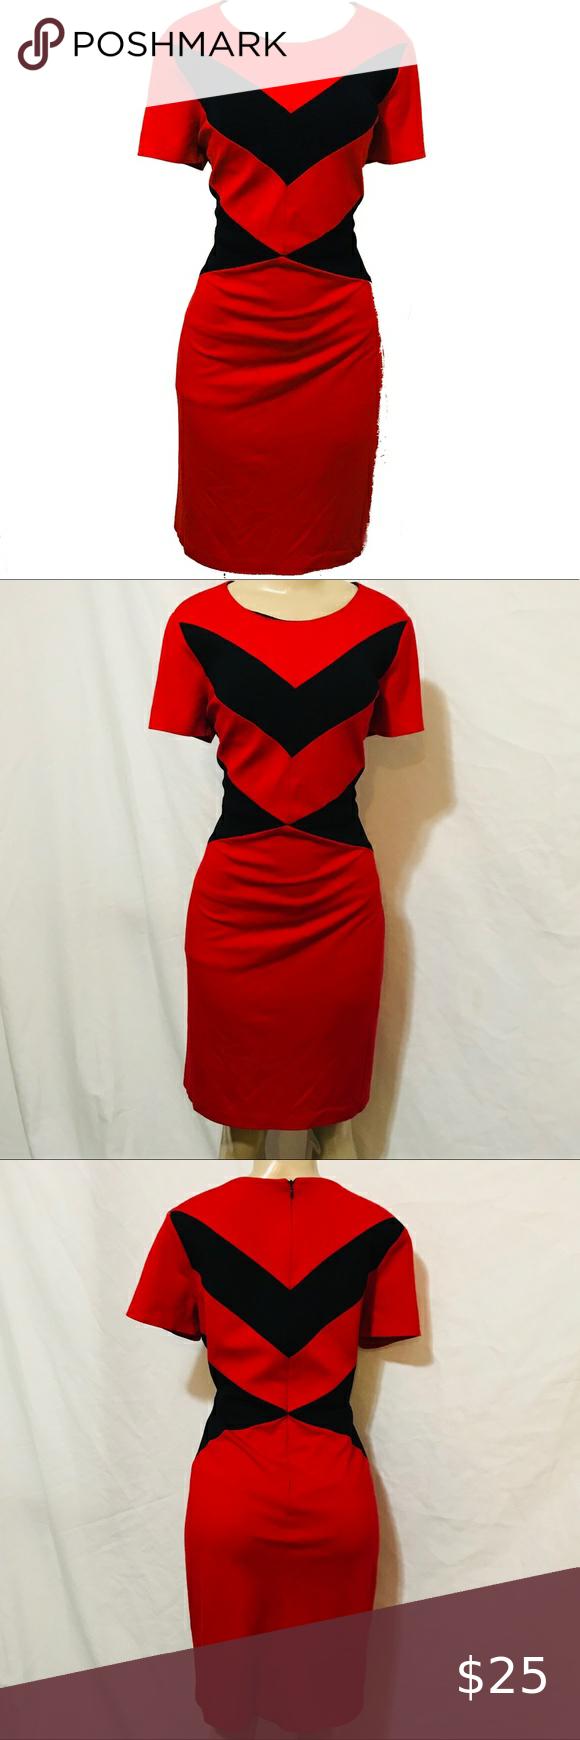 Vince Camuto Red Black Career Work Dress 10 Dresses For Work Colorblock Dress Dresses [ 1740 x 580 Pixel ]